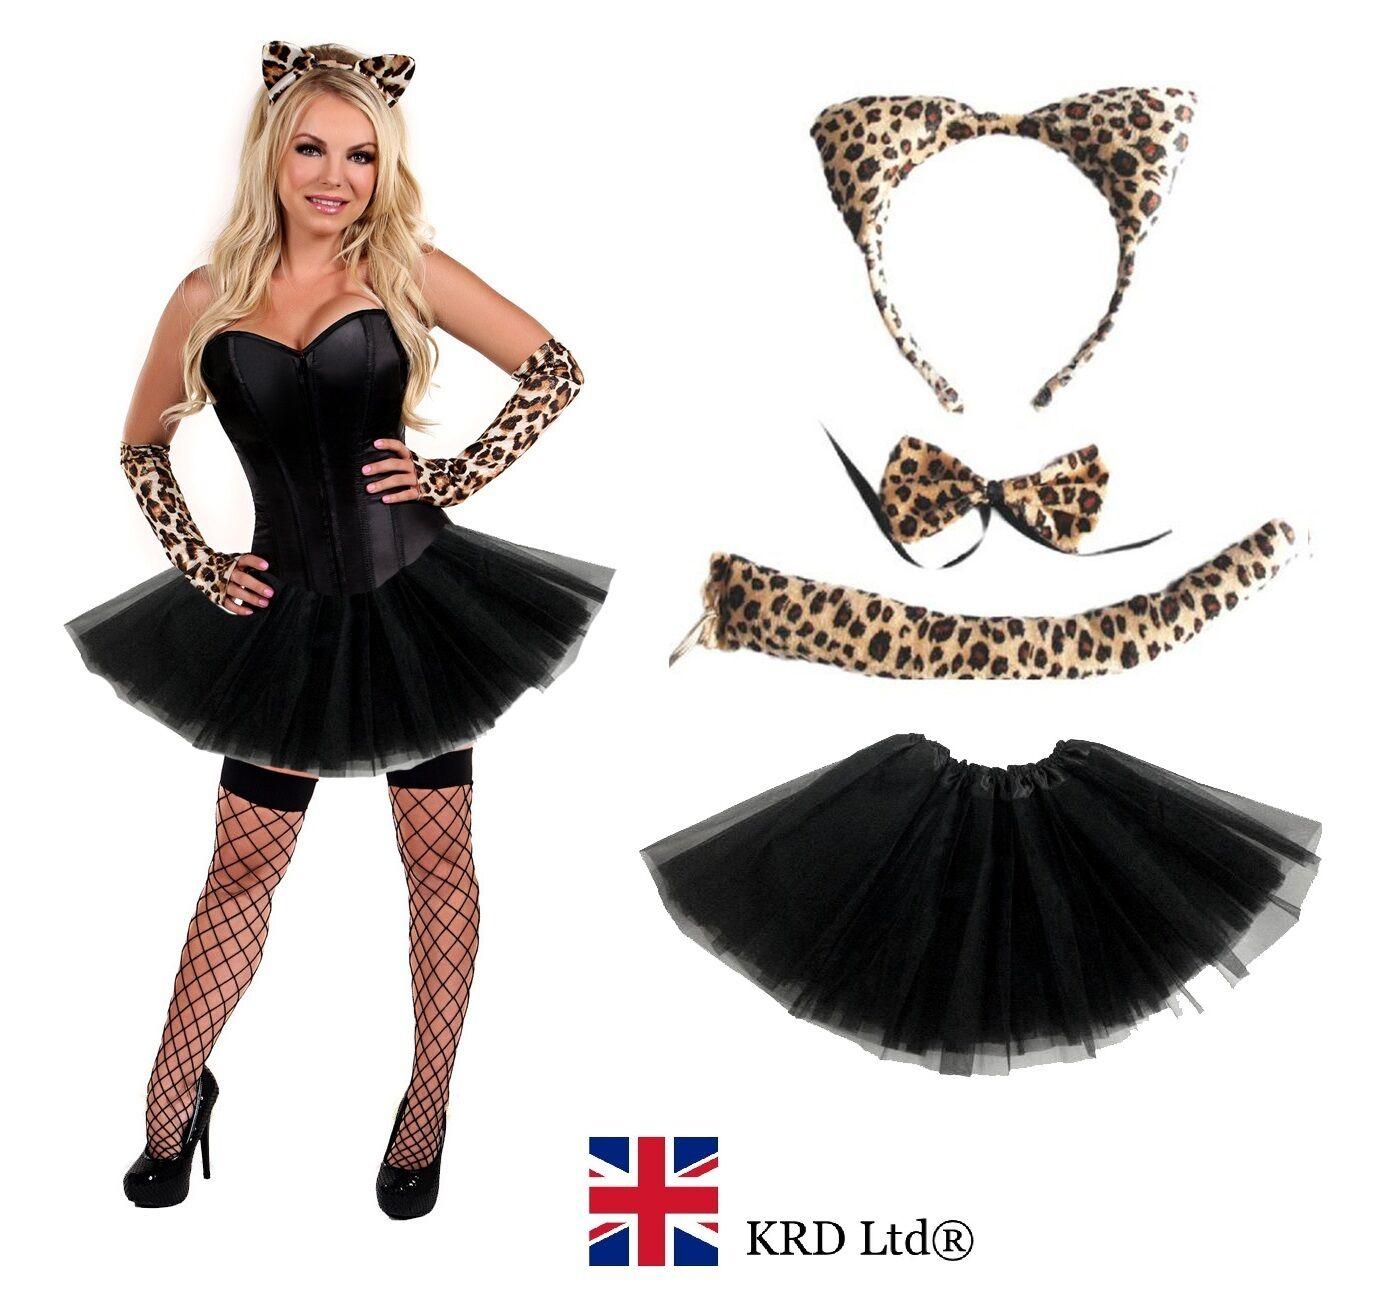 damen leopard halloween kost m m dchen raubkatze t t. Black Bedroom Furniture Sets. Home Design Ideas